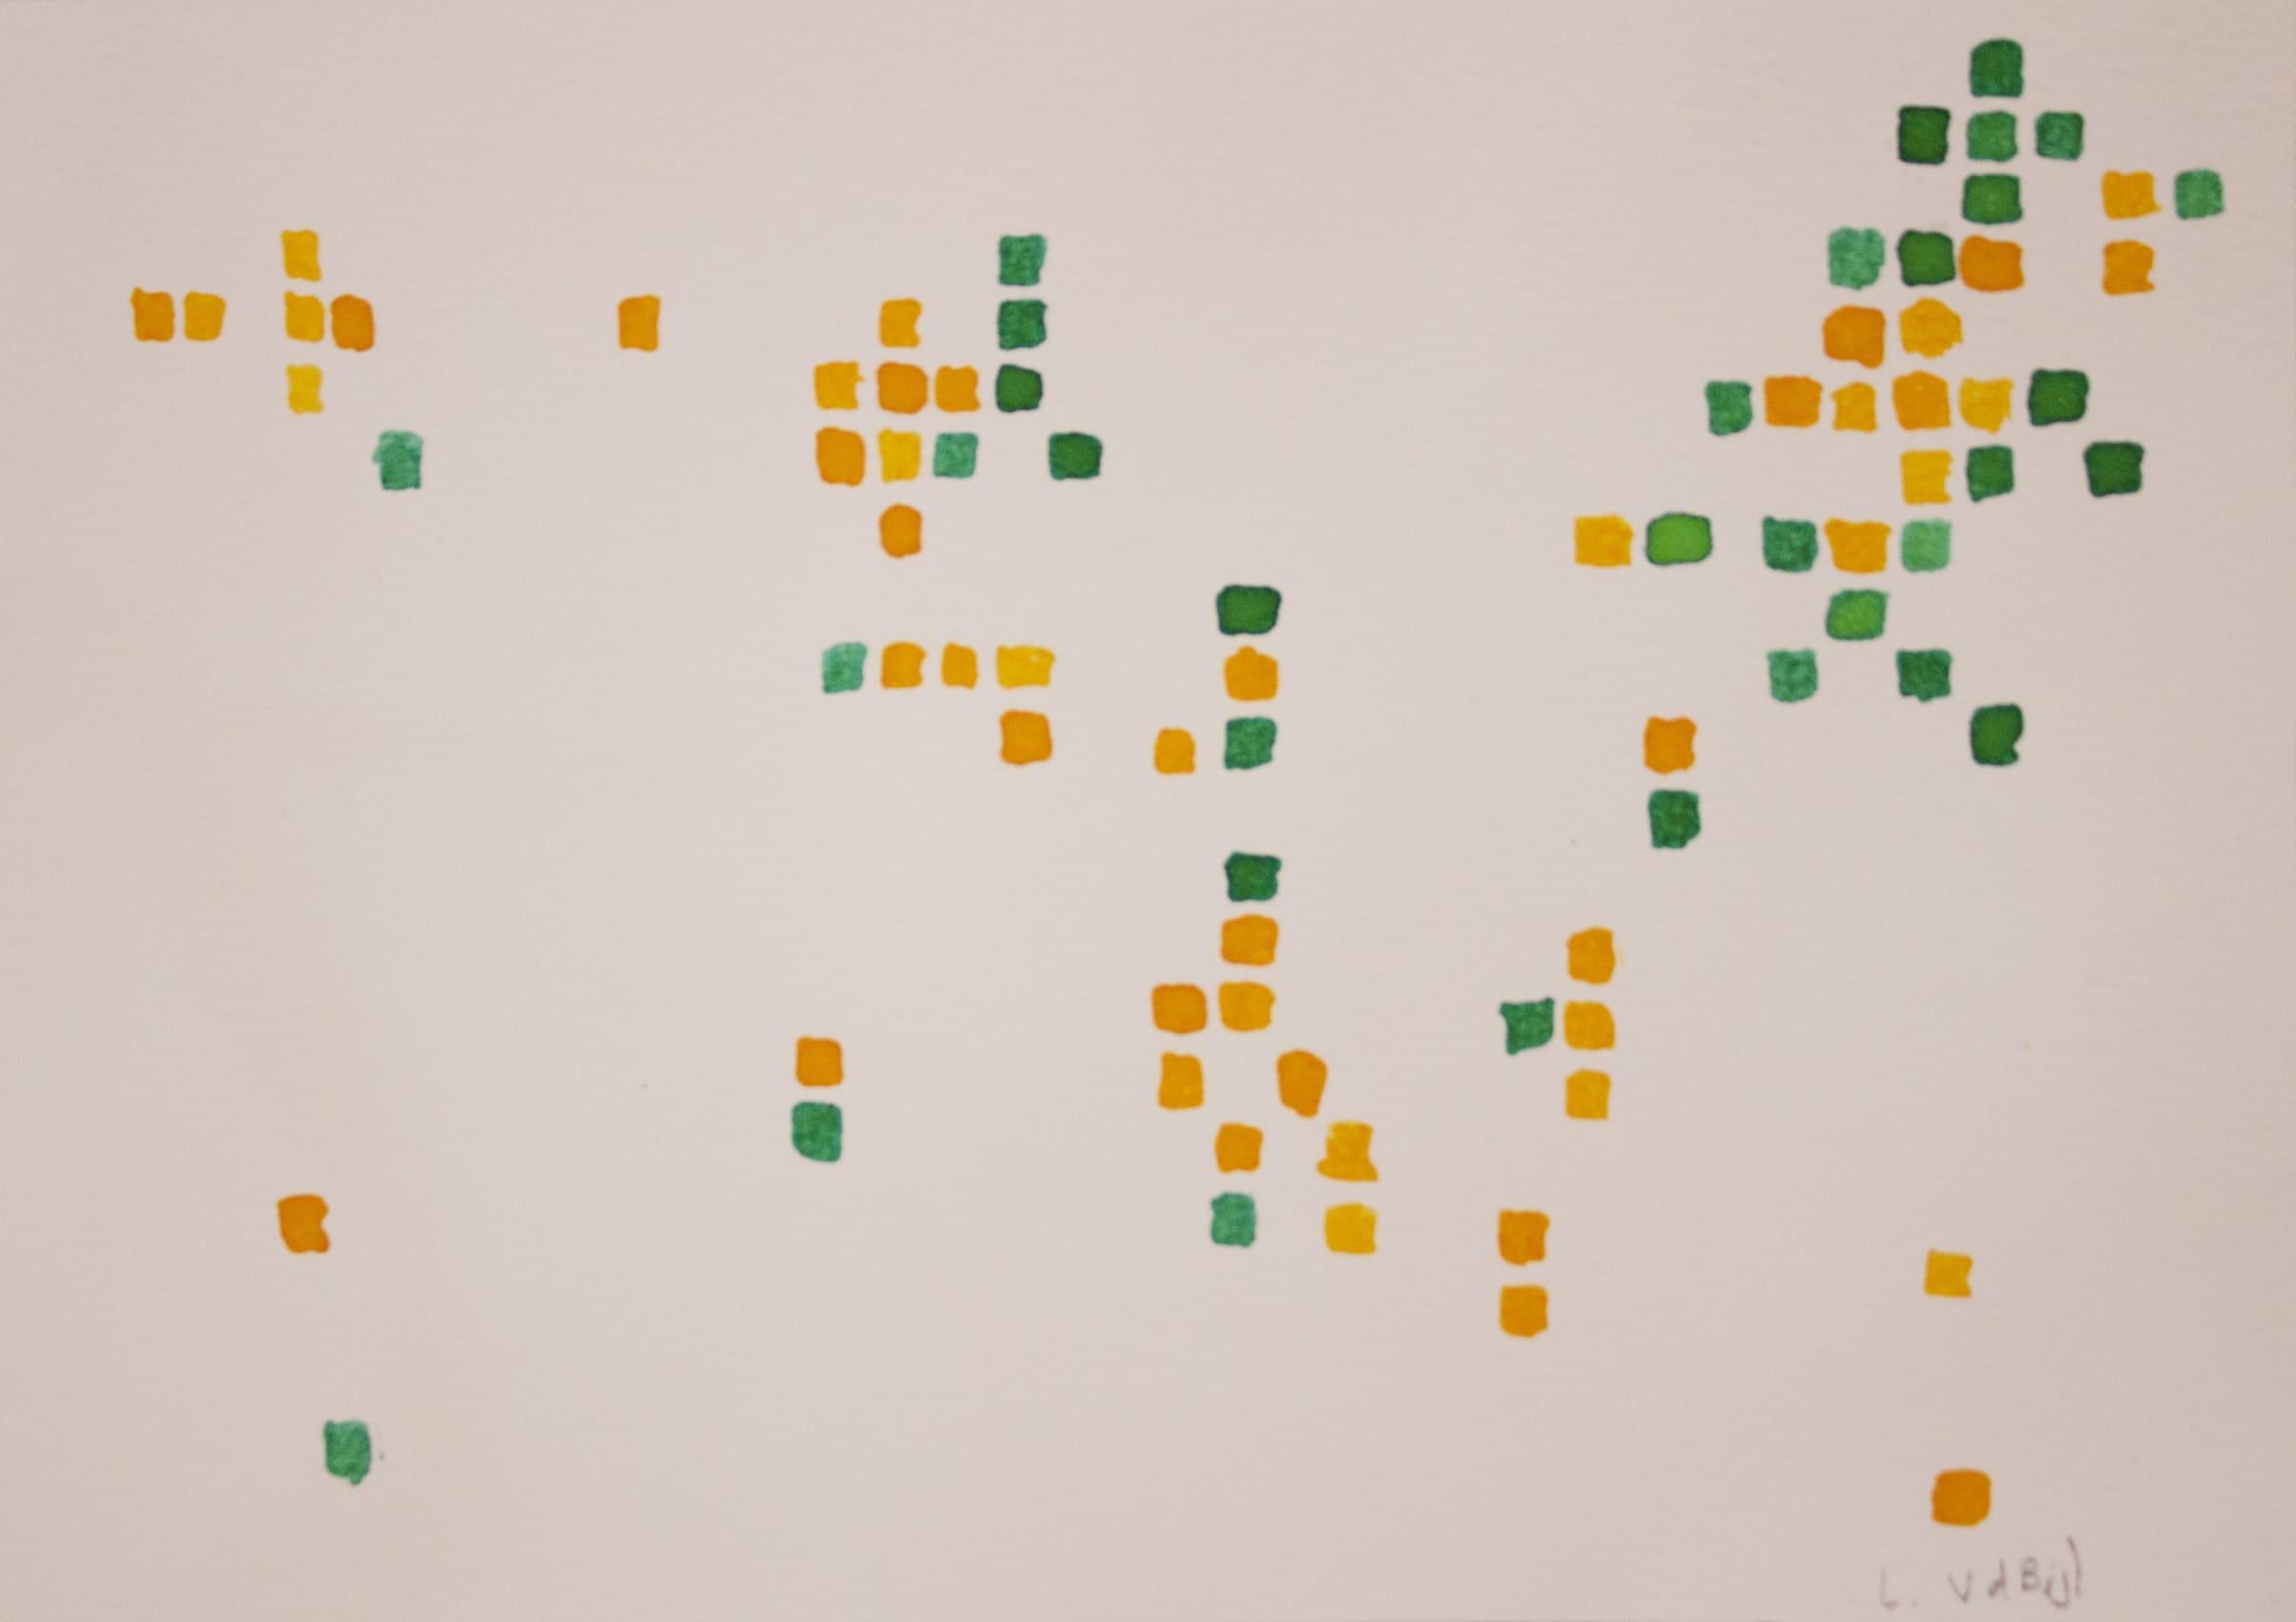 <span class=&#34;link fancybox-details-link&#34;><a href=&#34;/artists/88-louise-van-der-bijl/works/2289-louise-van-der-bijl-inktober-day-26-2018/&#34;>View Detail Page</a></span><div class=&#34;artist&#34;><strong>Louise Van Der Bijl</strong></div> <div class=&#34;title&#34;><em>Inktober Day 26</em>, 2018</div> <div class=&#34;medium&#34;>Ink On Paper</div> <div class=&#34;dimensions&#34;>15.1cm x 21.3cm</div><div class=&#34;price&#34;>R400.00</div>